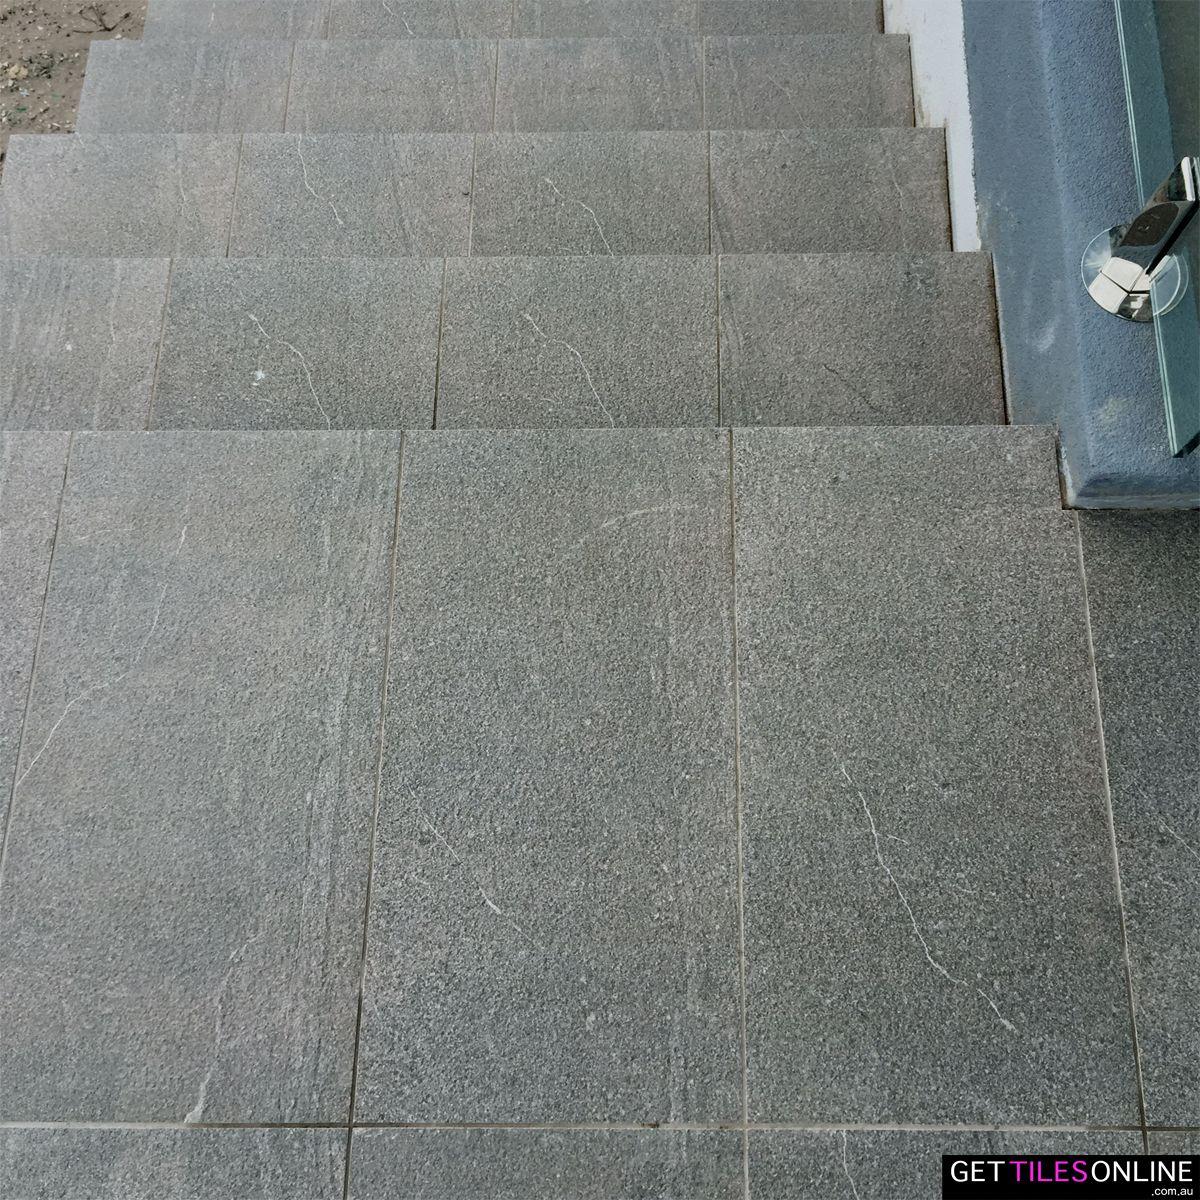 Buy Cheap Outdoor Tile - Nature Vein Charcoal 300x600 | Get Tiles ...